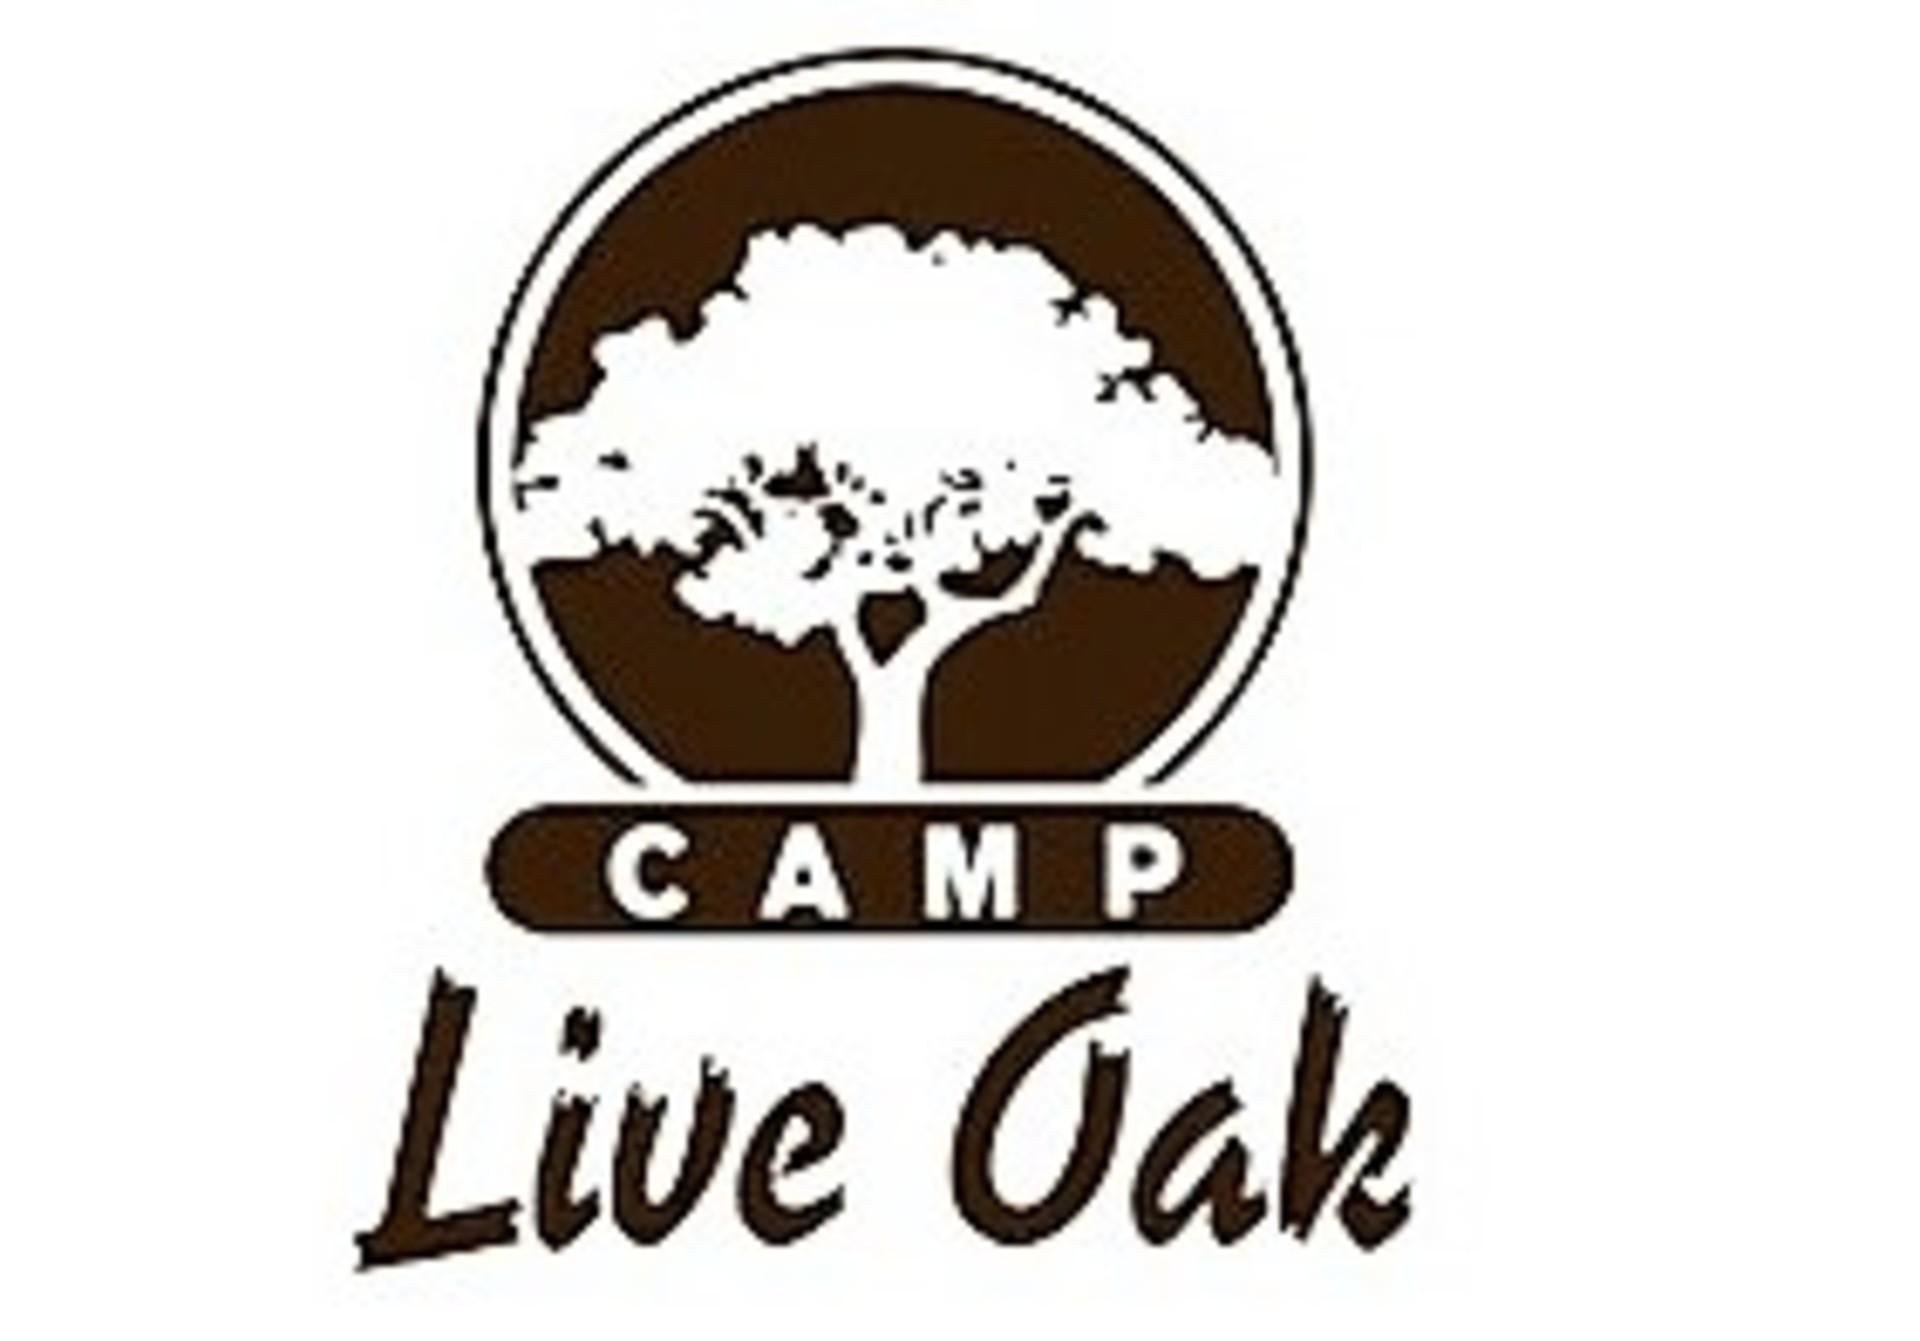 Camp Live Oak presents First Annual Autumn Leaves Gala